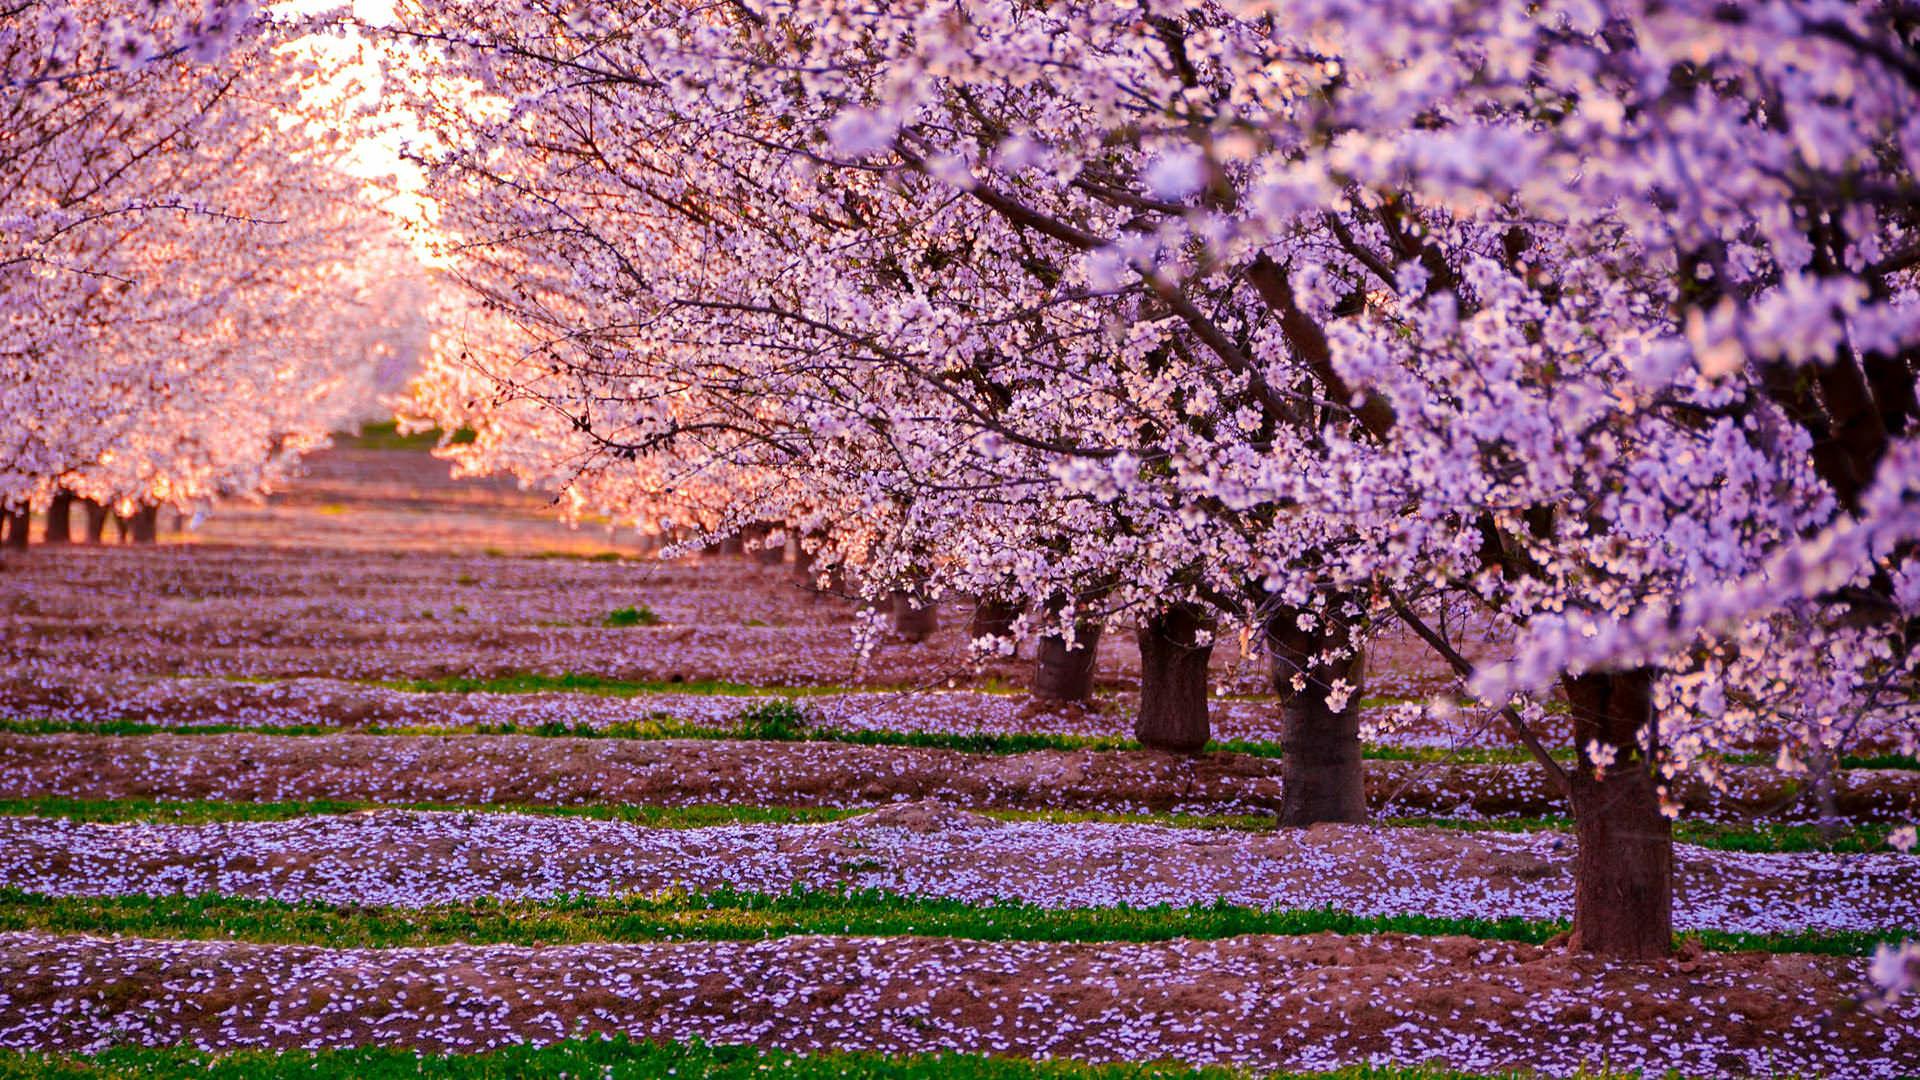 Cherry blossom wallpaper full HD